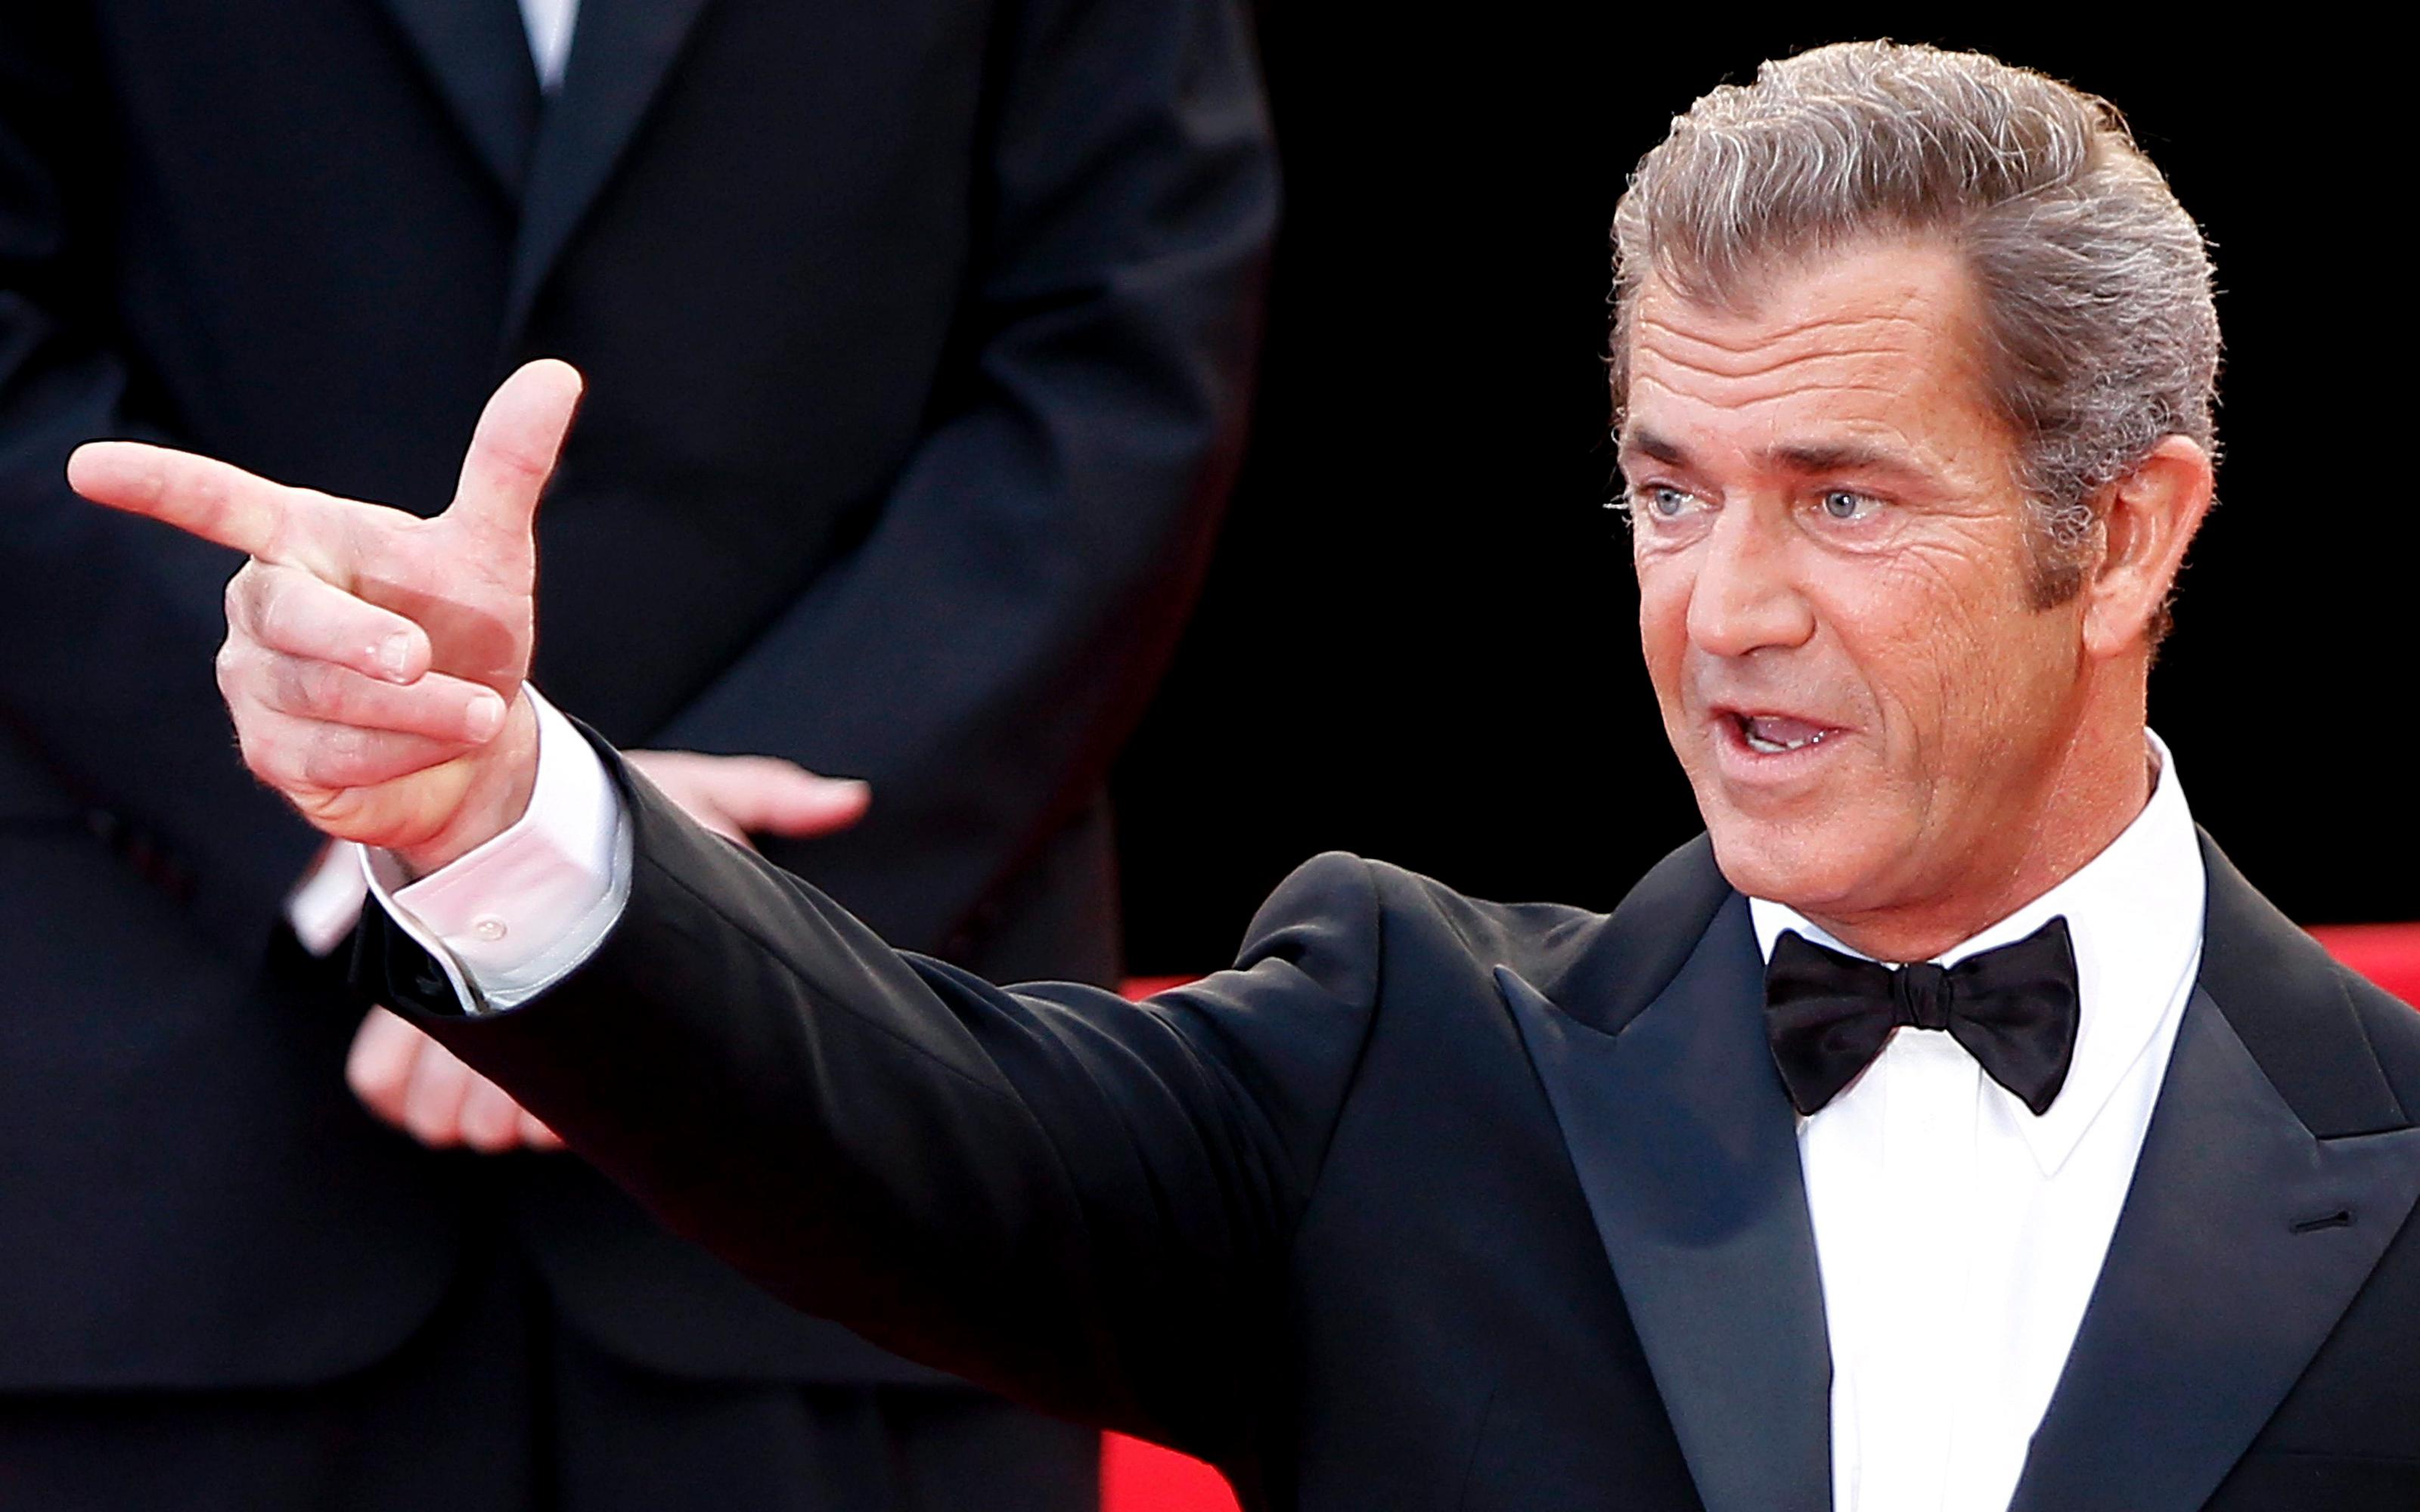 Mel Gibson HD Wallpaper Background Image 3200x2000 ID519379 3200x2000